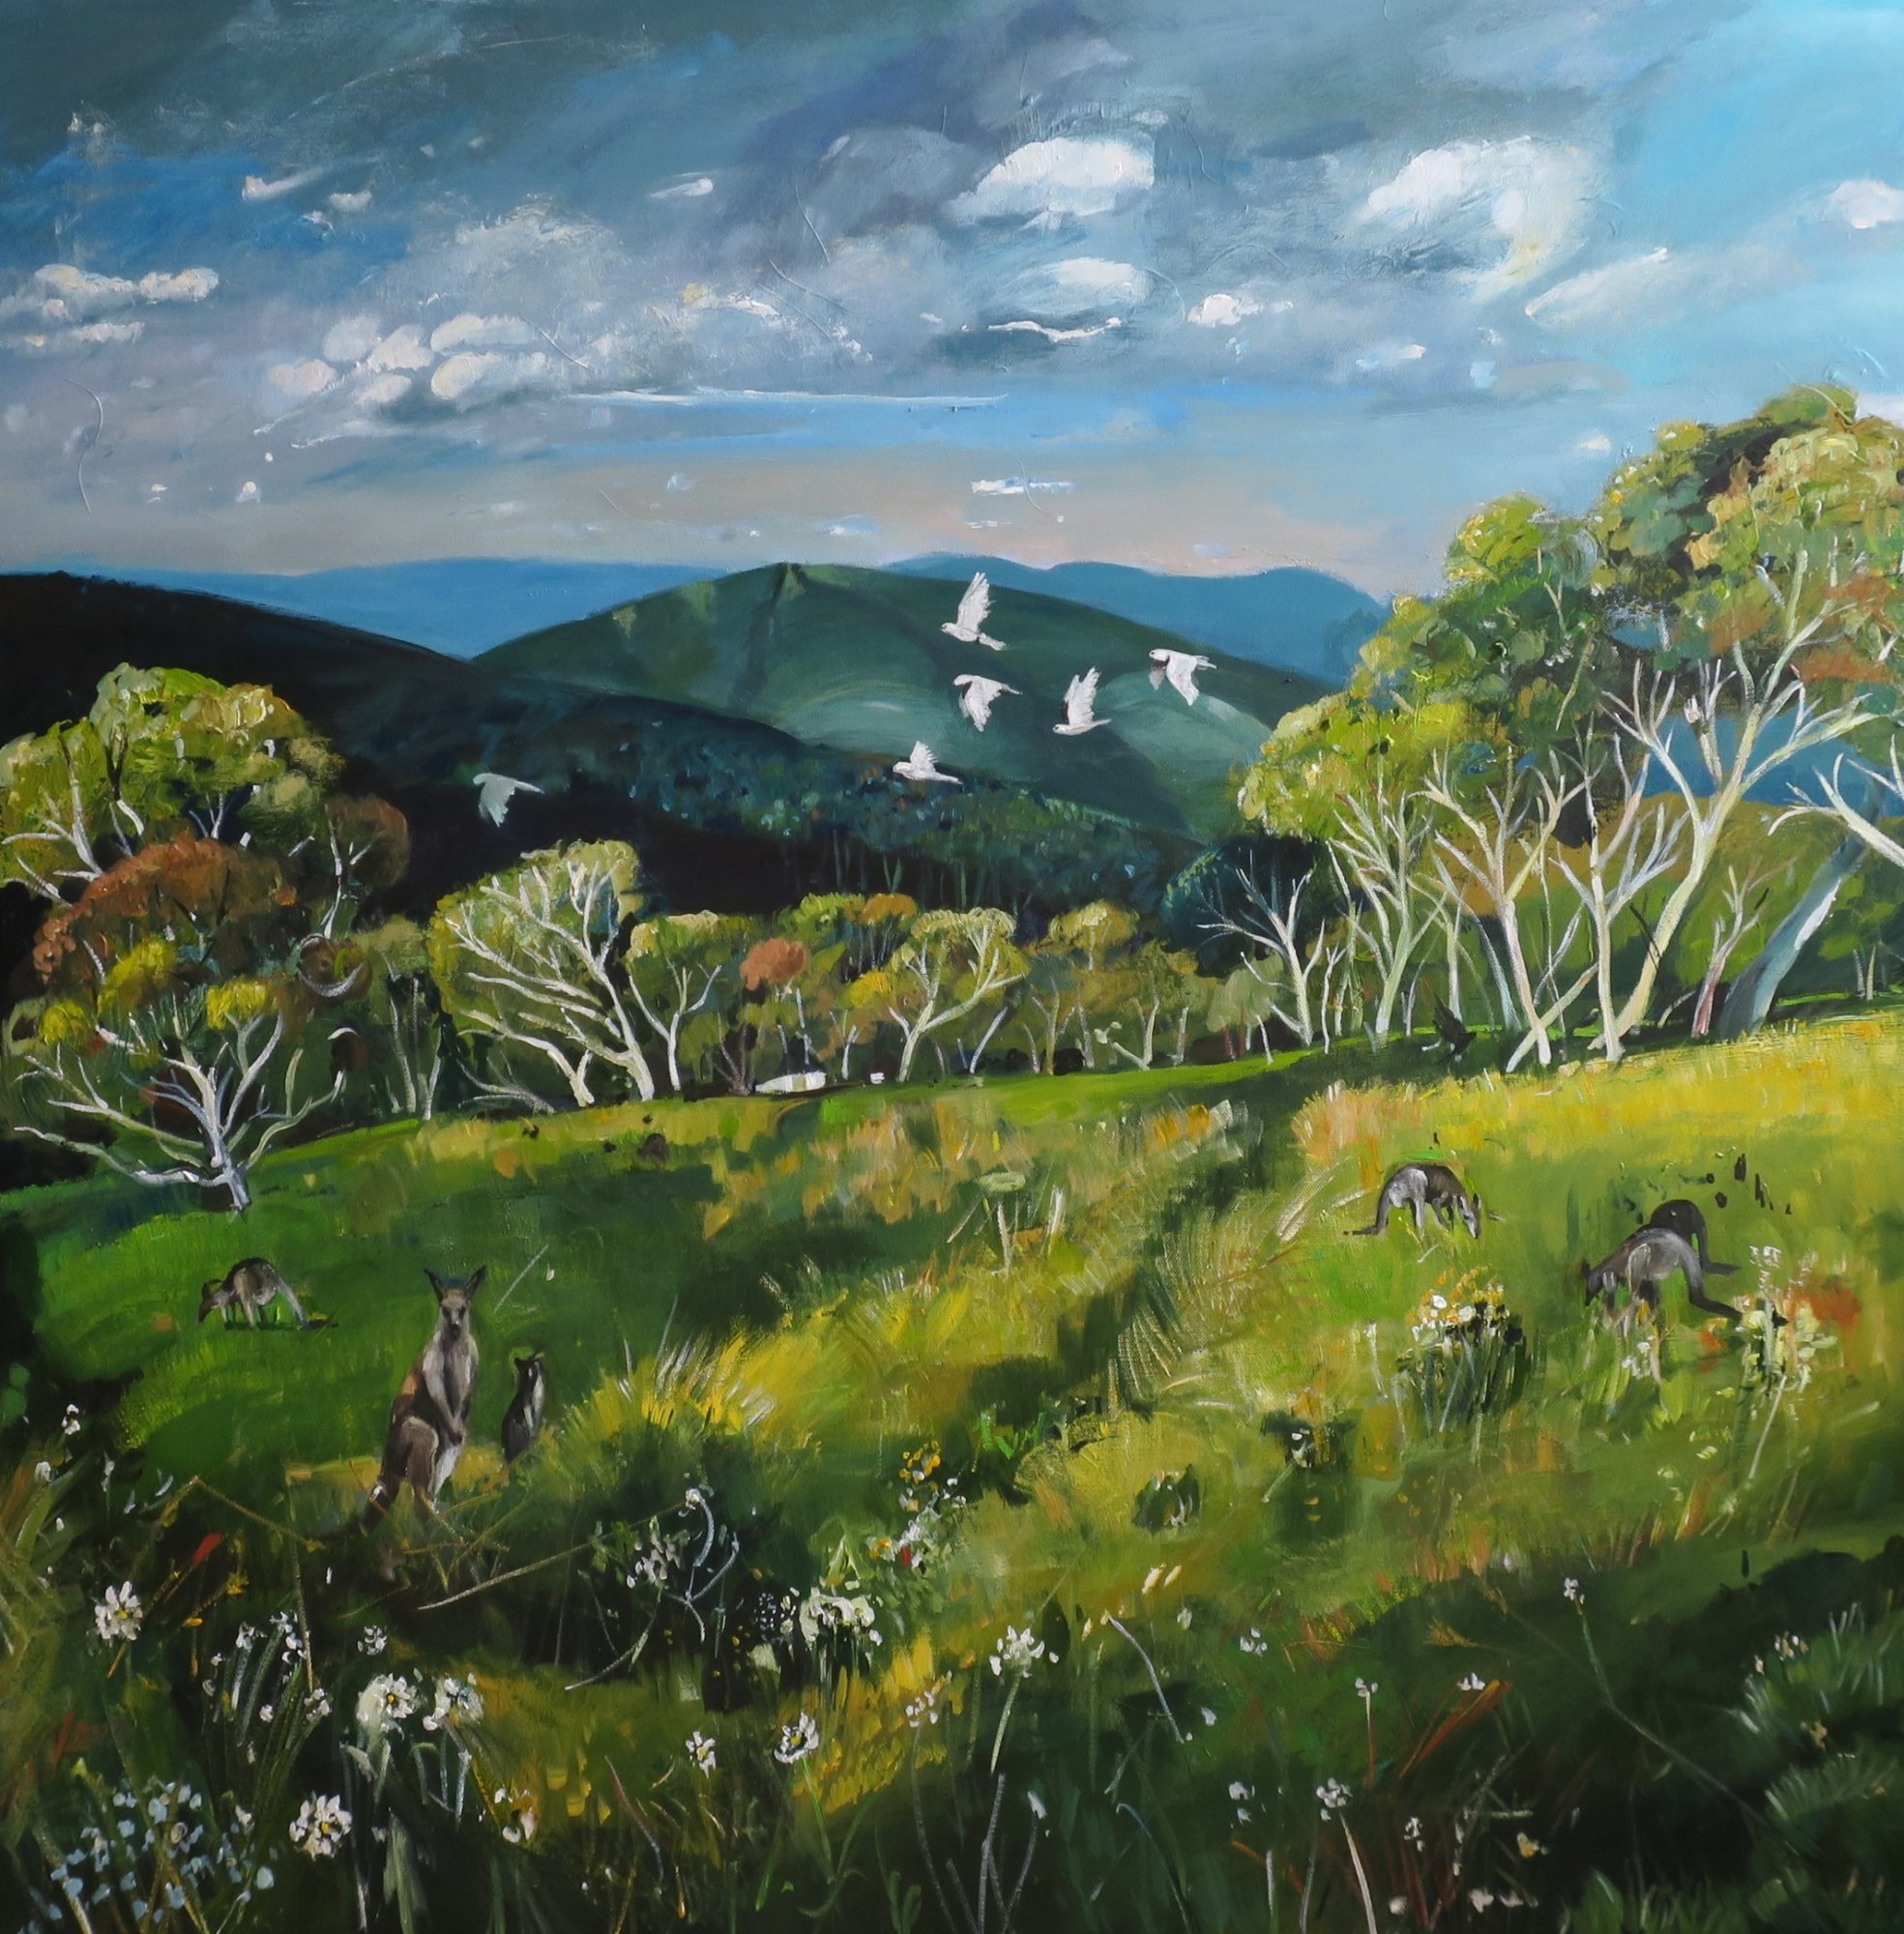 kangaroo meadow.jpg a